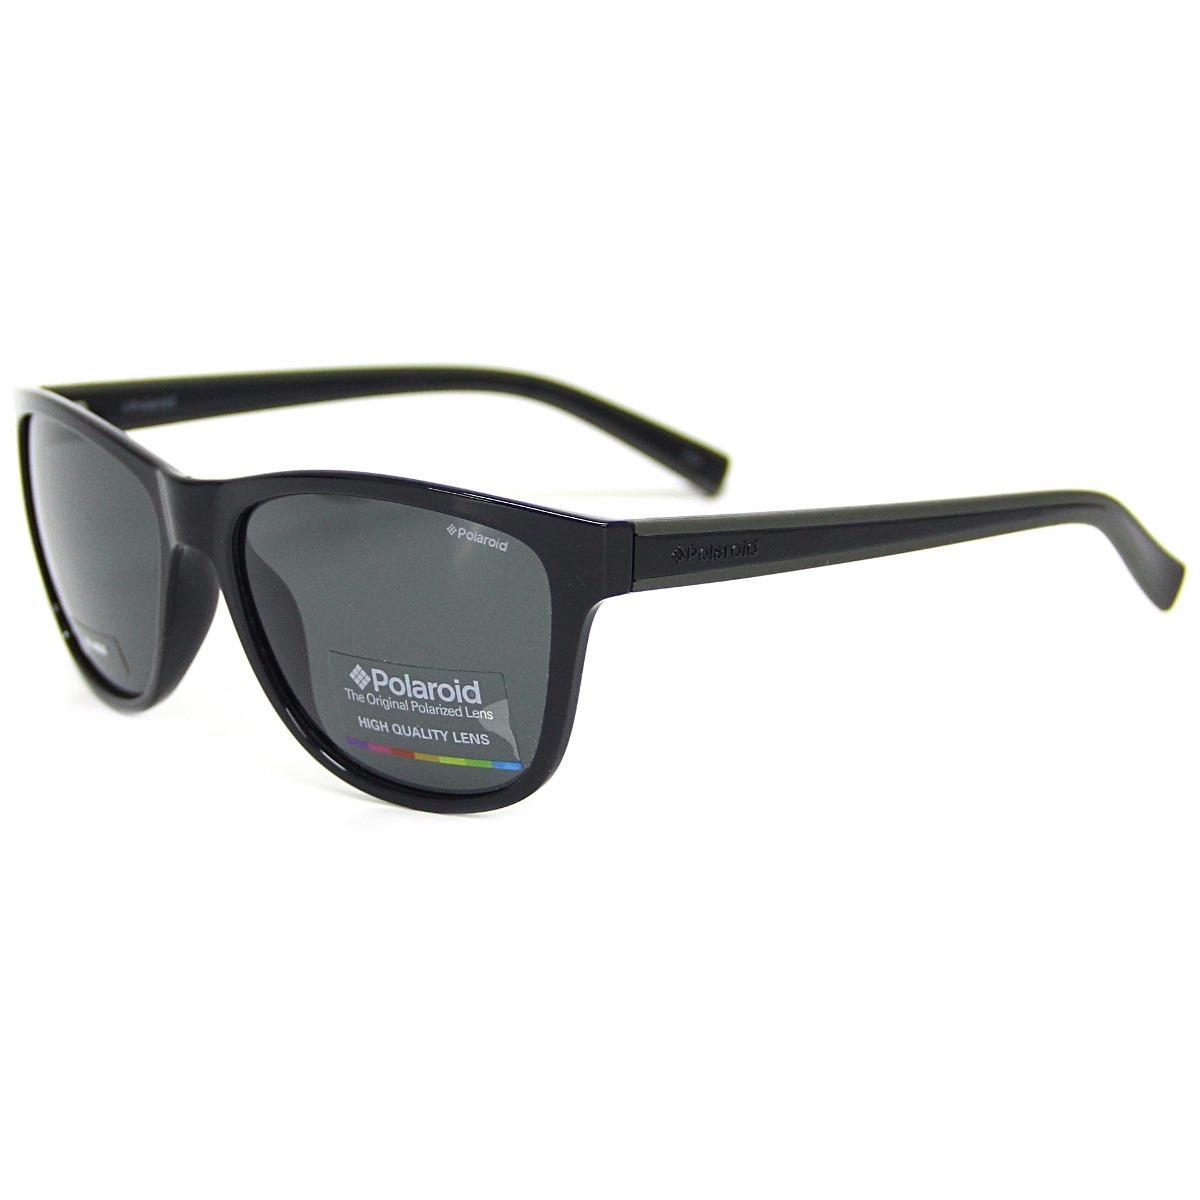 Óculos Sol Polaroid 2009 Polarizado Masculino - Promoção - R  179,00 ... 64ead94d39